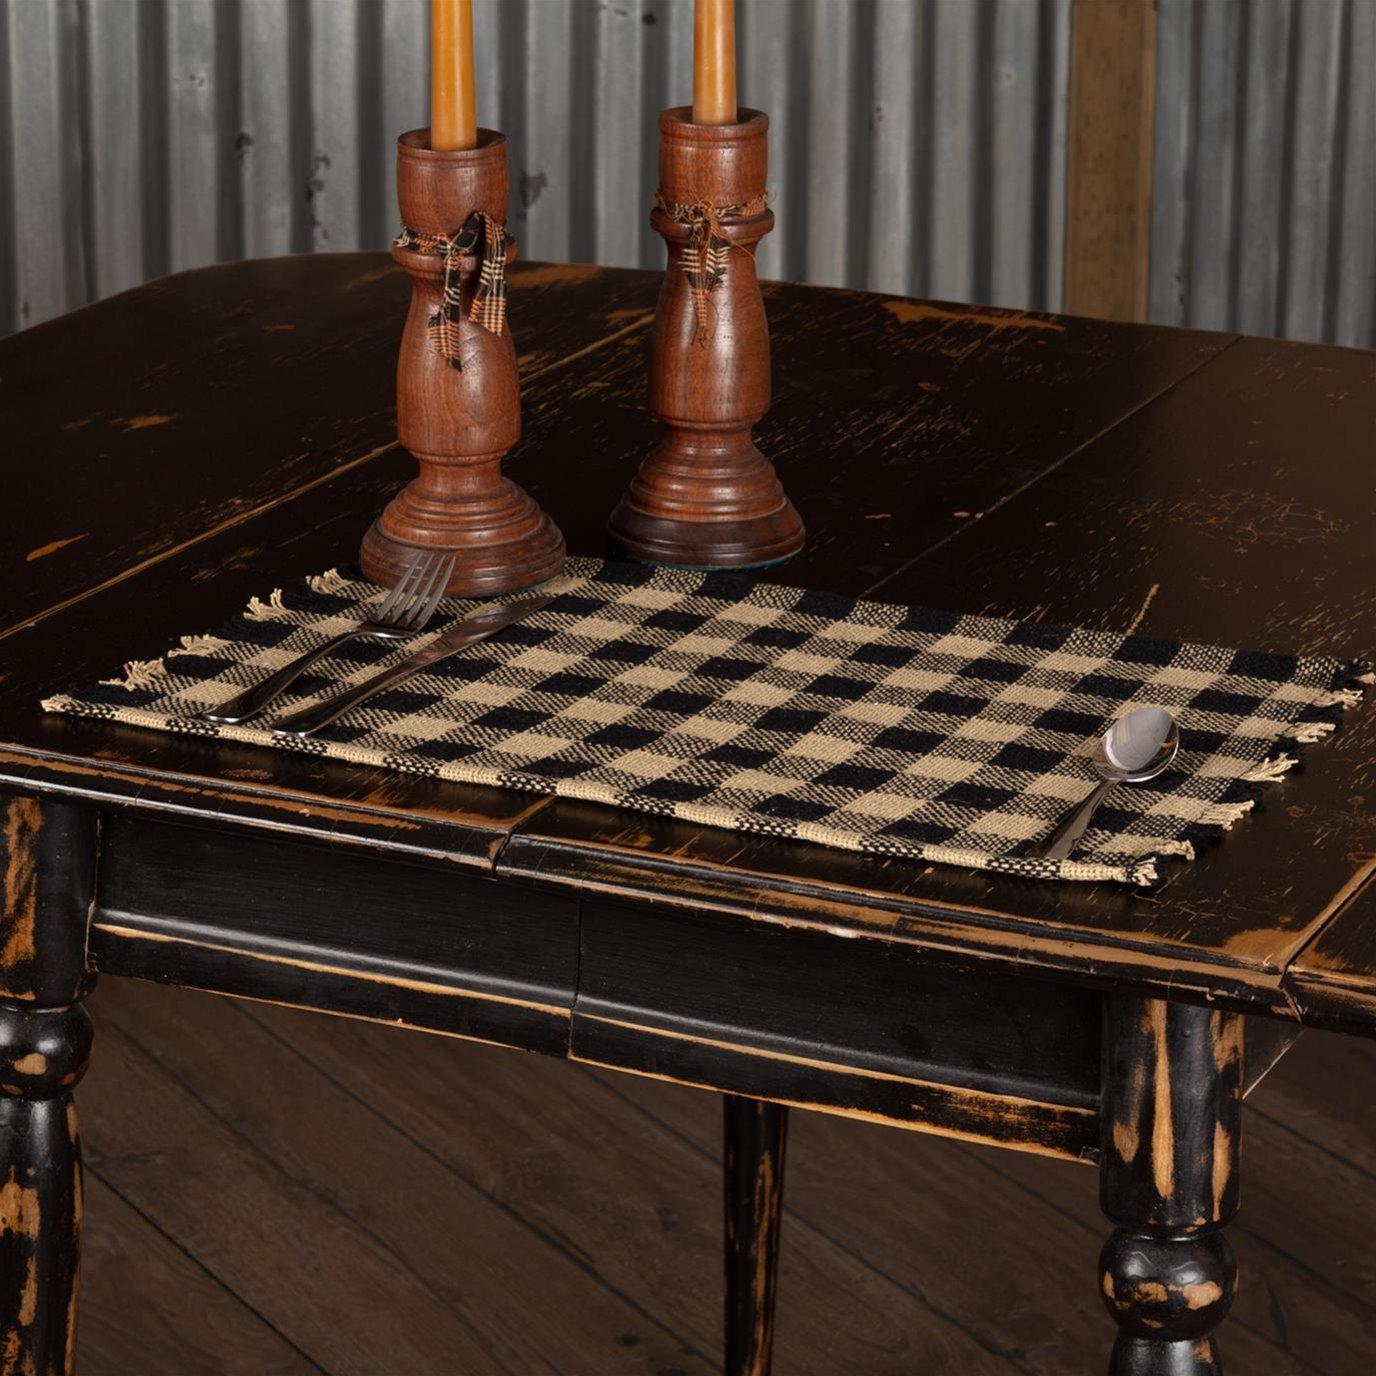 Burlap Black Check Placemat Fringed Set of 6 12x18